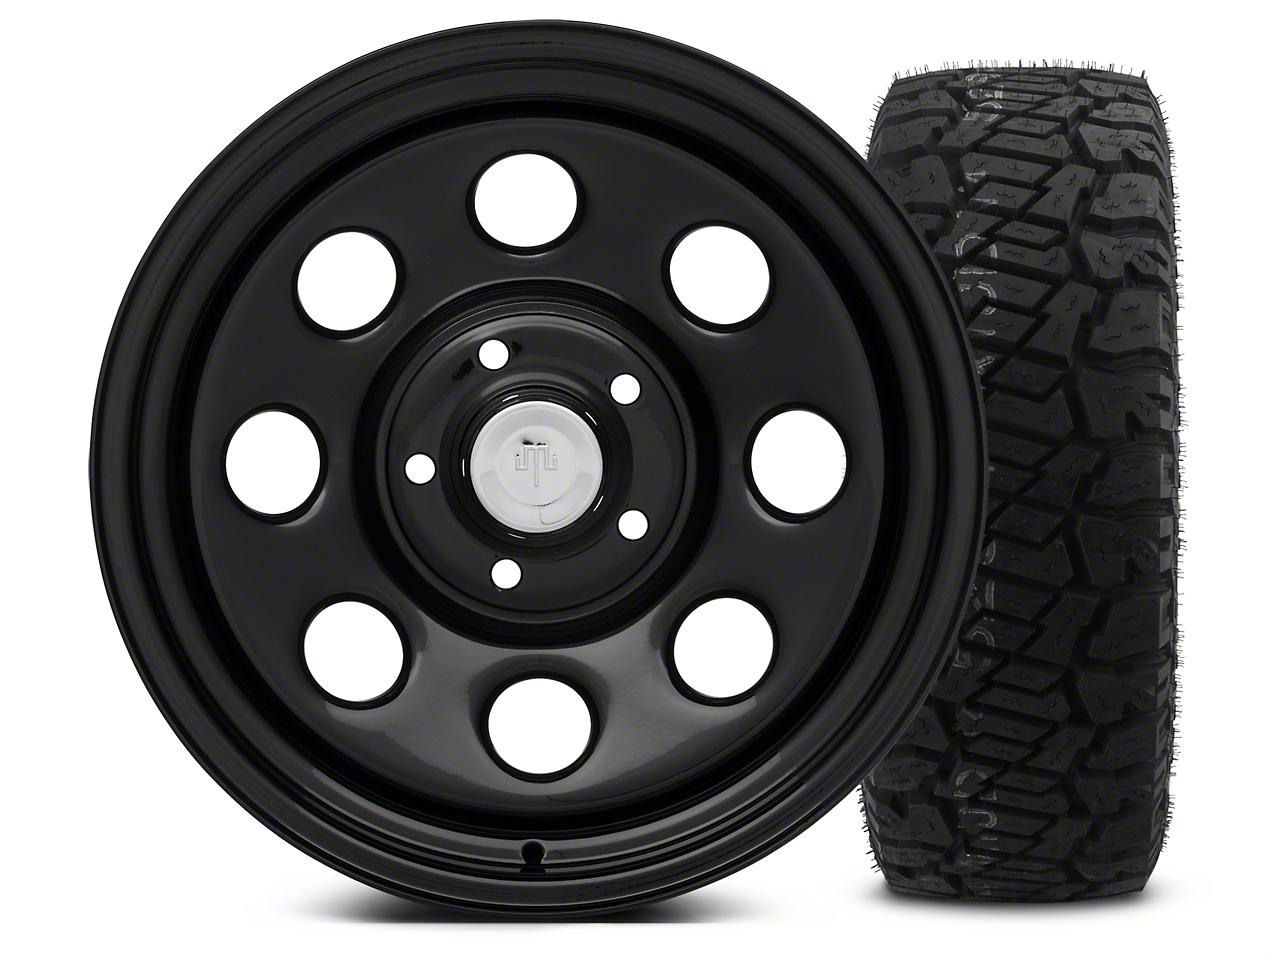 Mammoth 8 Black Steel - 17x9 Wheel - and Dick Cepek Fun Country Tire - 315/70R17 (07-18 Jeep Wrangler JK; 2018 Jeep Wrangler JL)